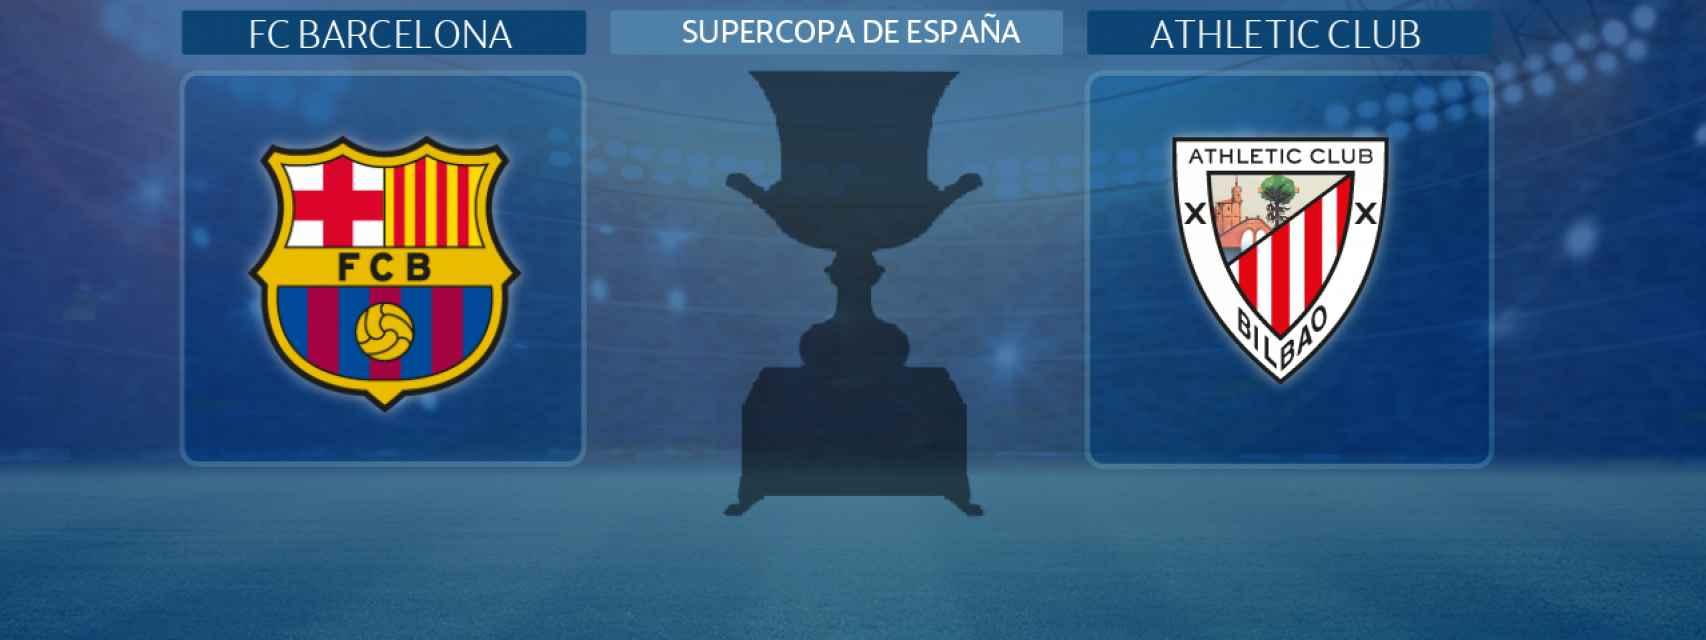 FC Barcelona - Athletic Club, final de la Supercopa de España